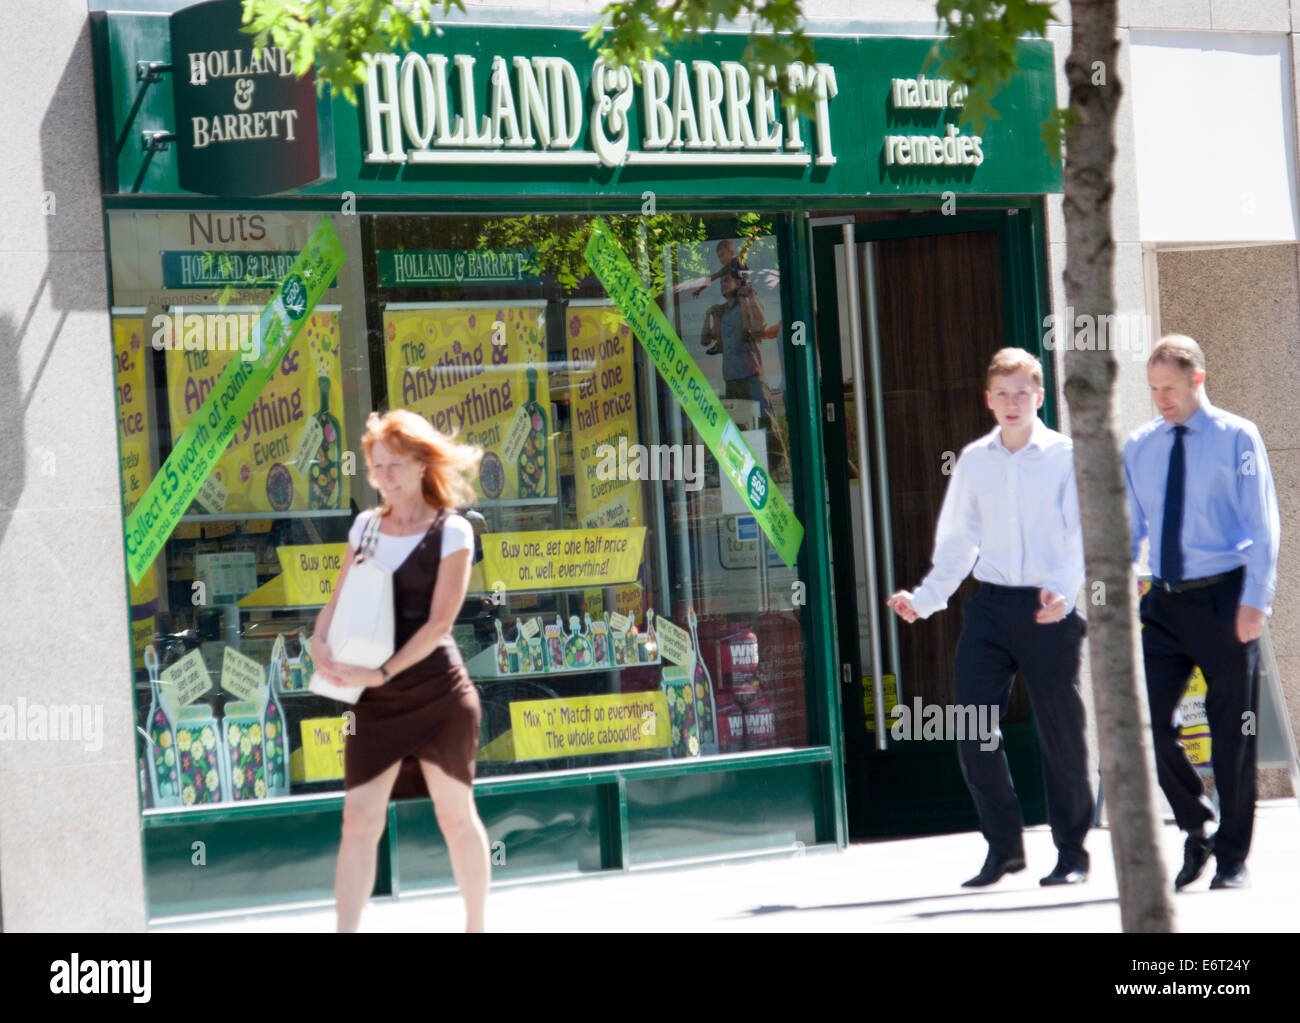 Holland and Barrett health food shop, London - Stock Image